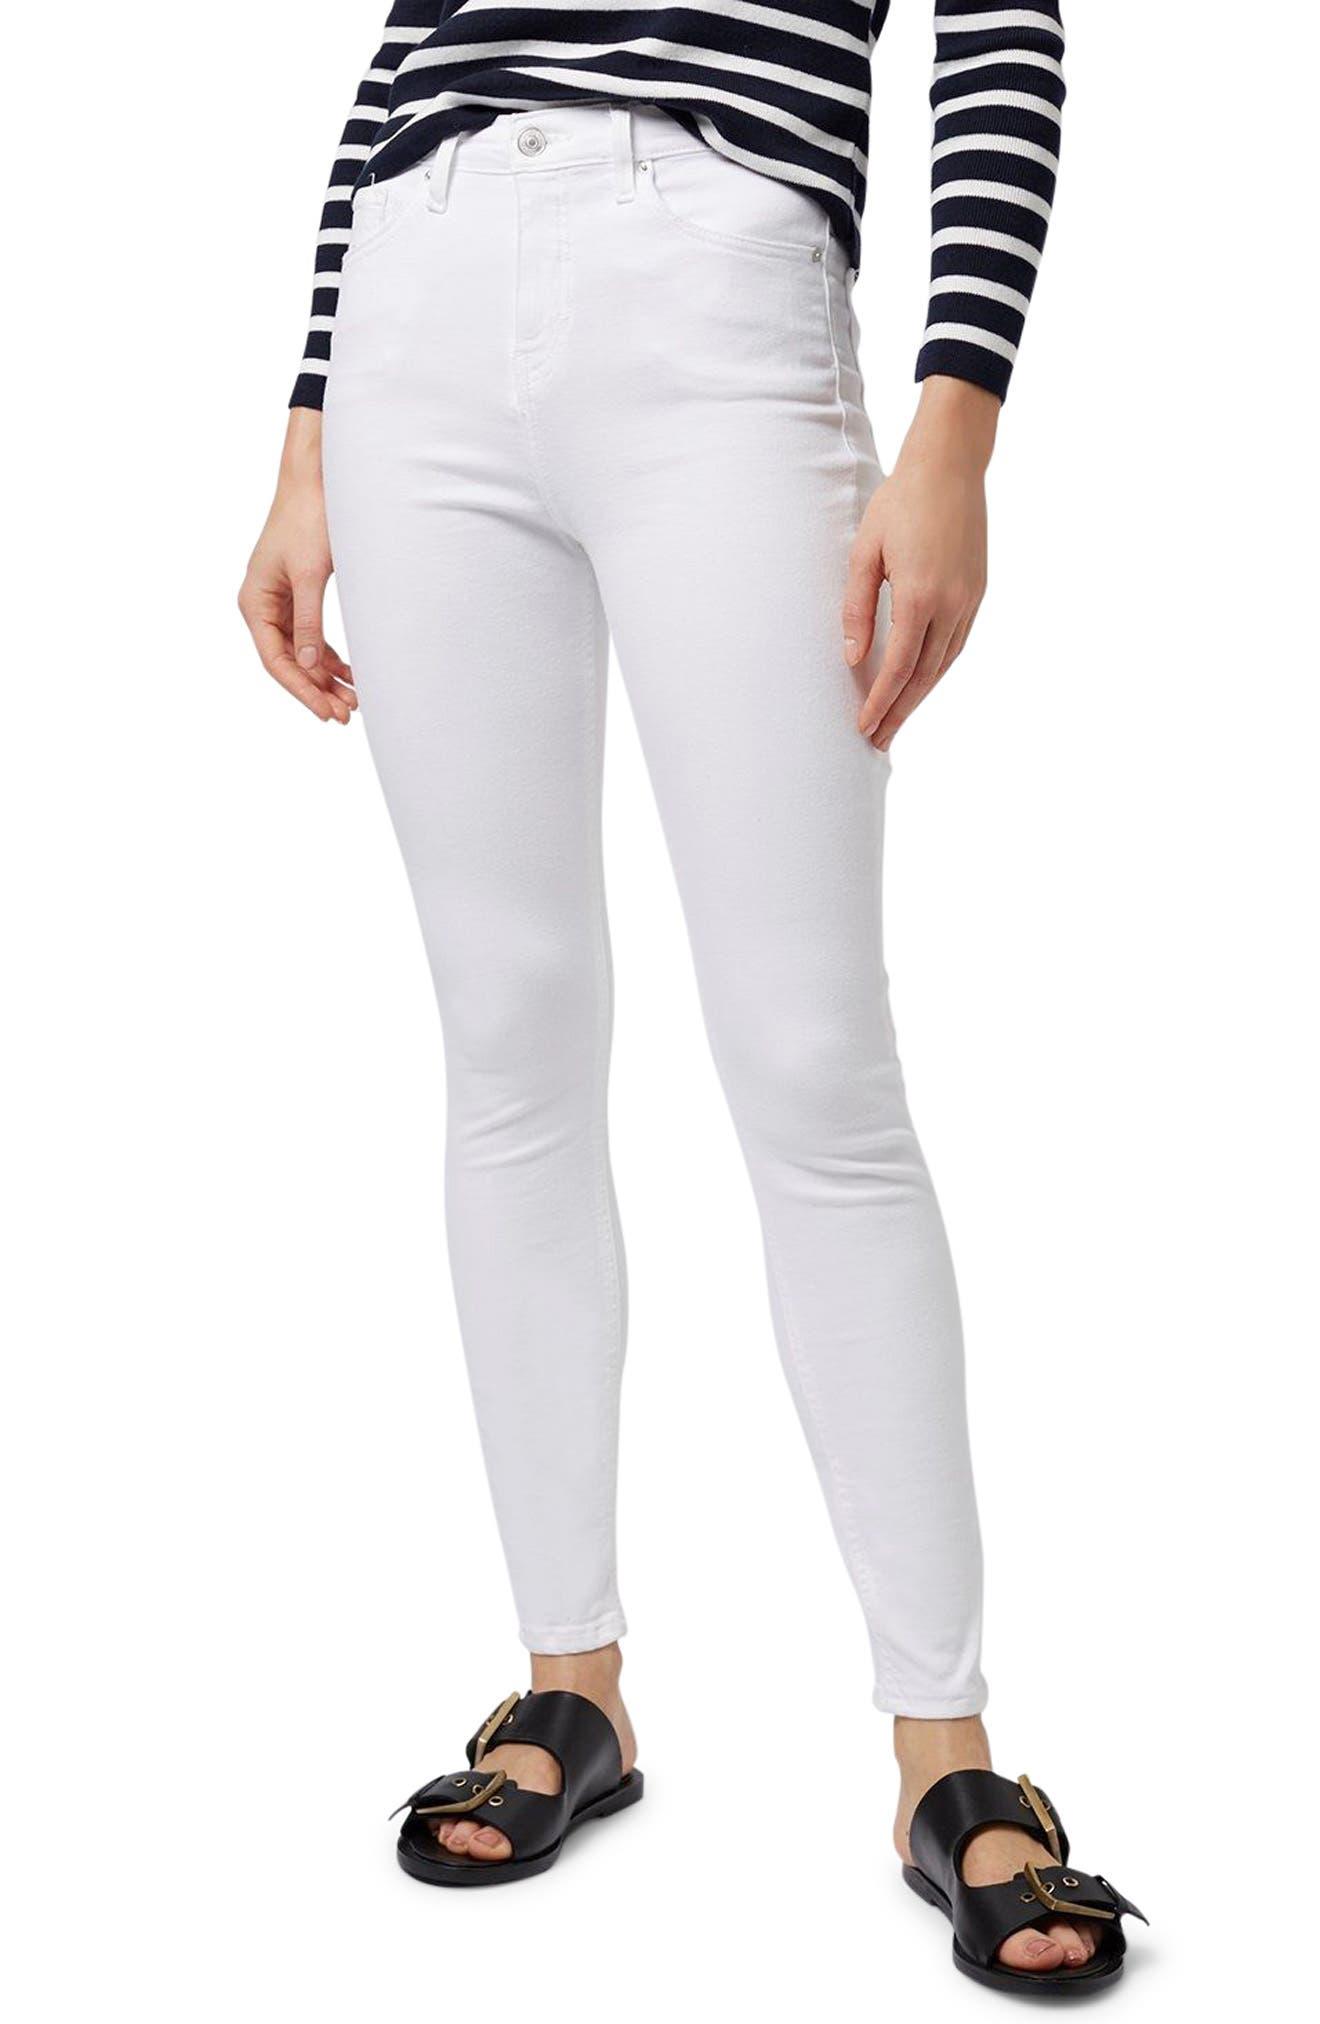 Moto Jamie Jeans,                         Main,                         color, White